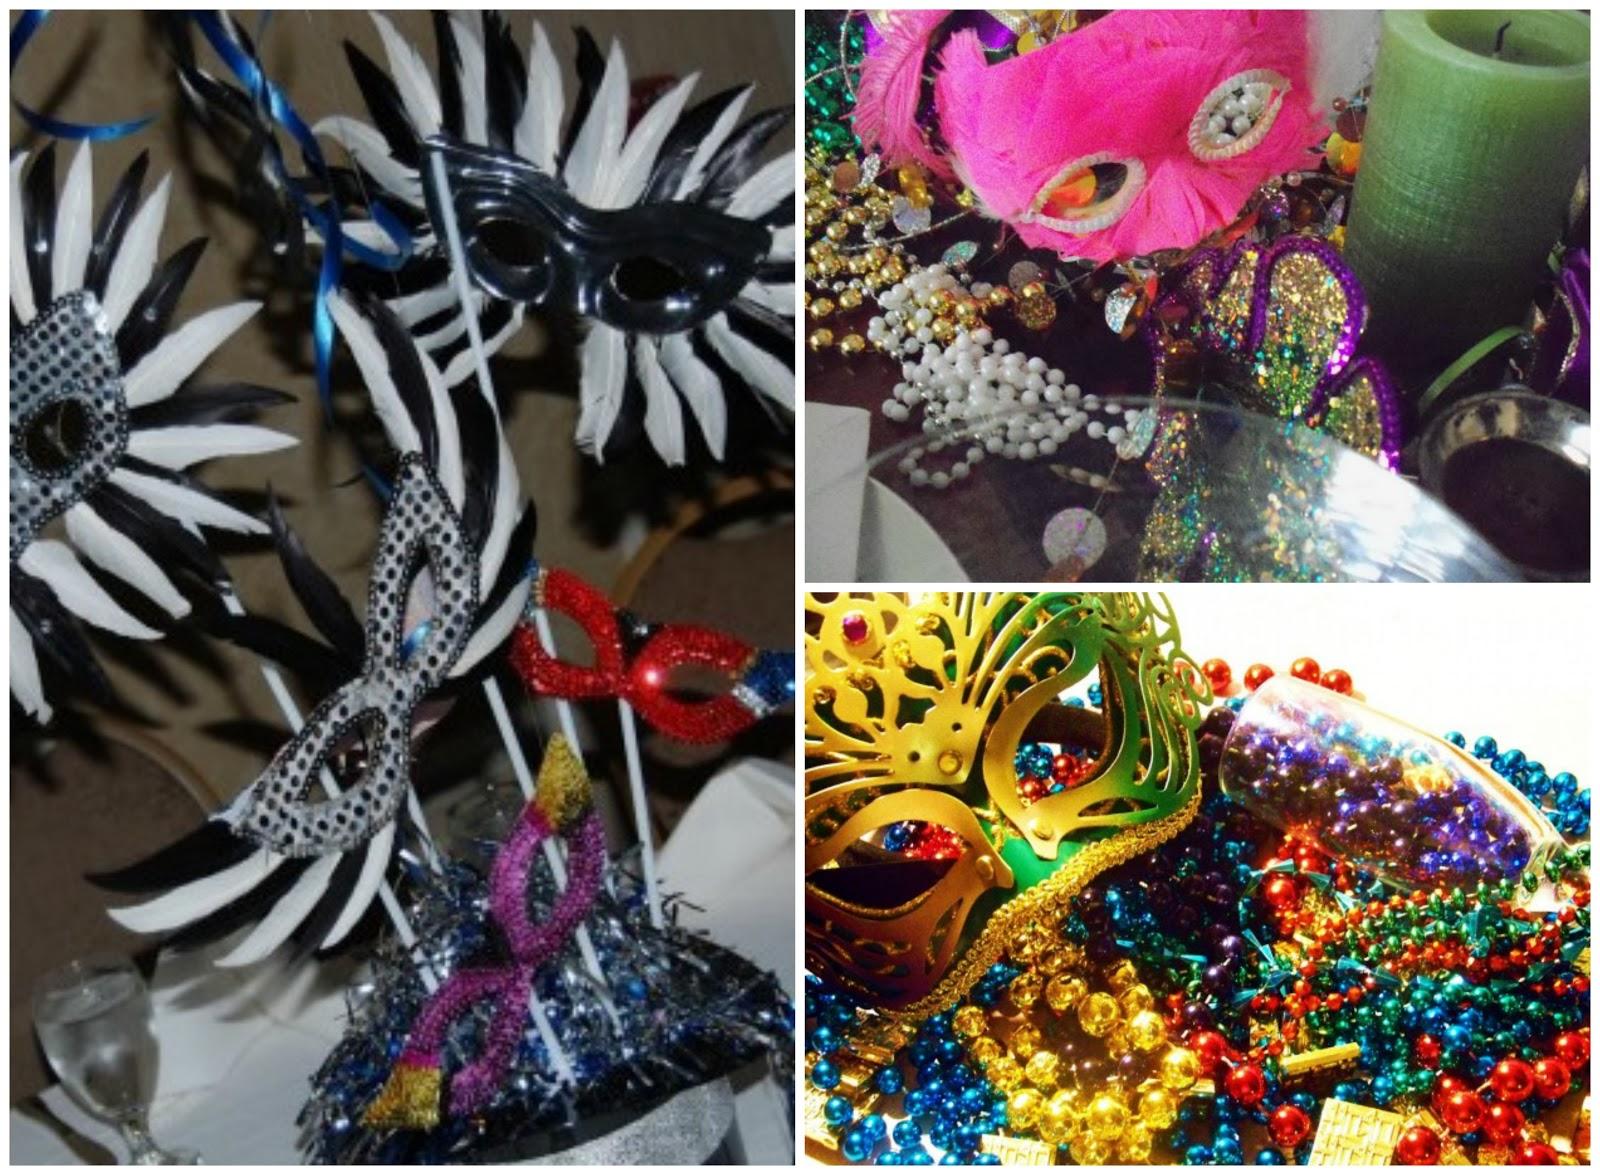 Llega carnaval disfraza tu casa decoraci n for Decoracion para carnaval